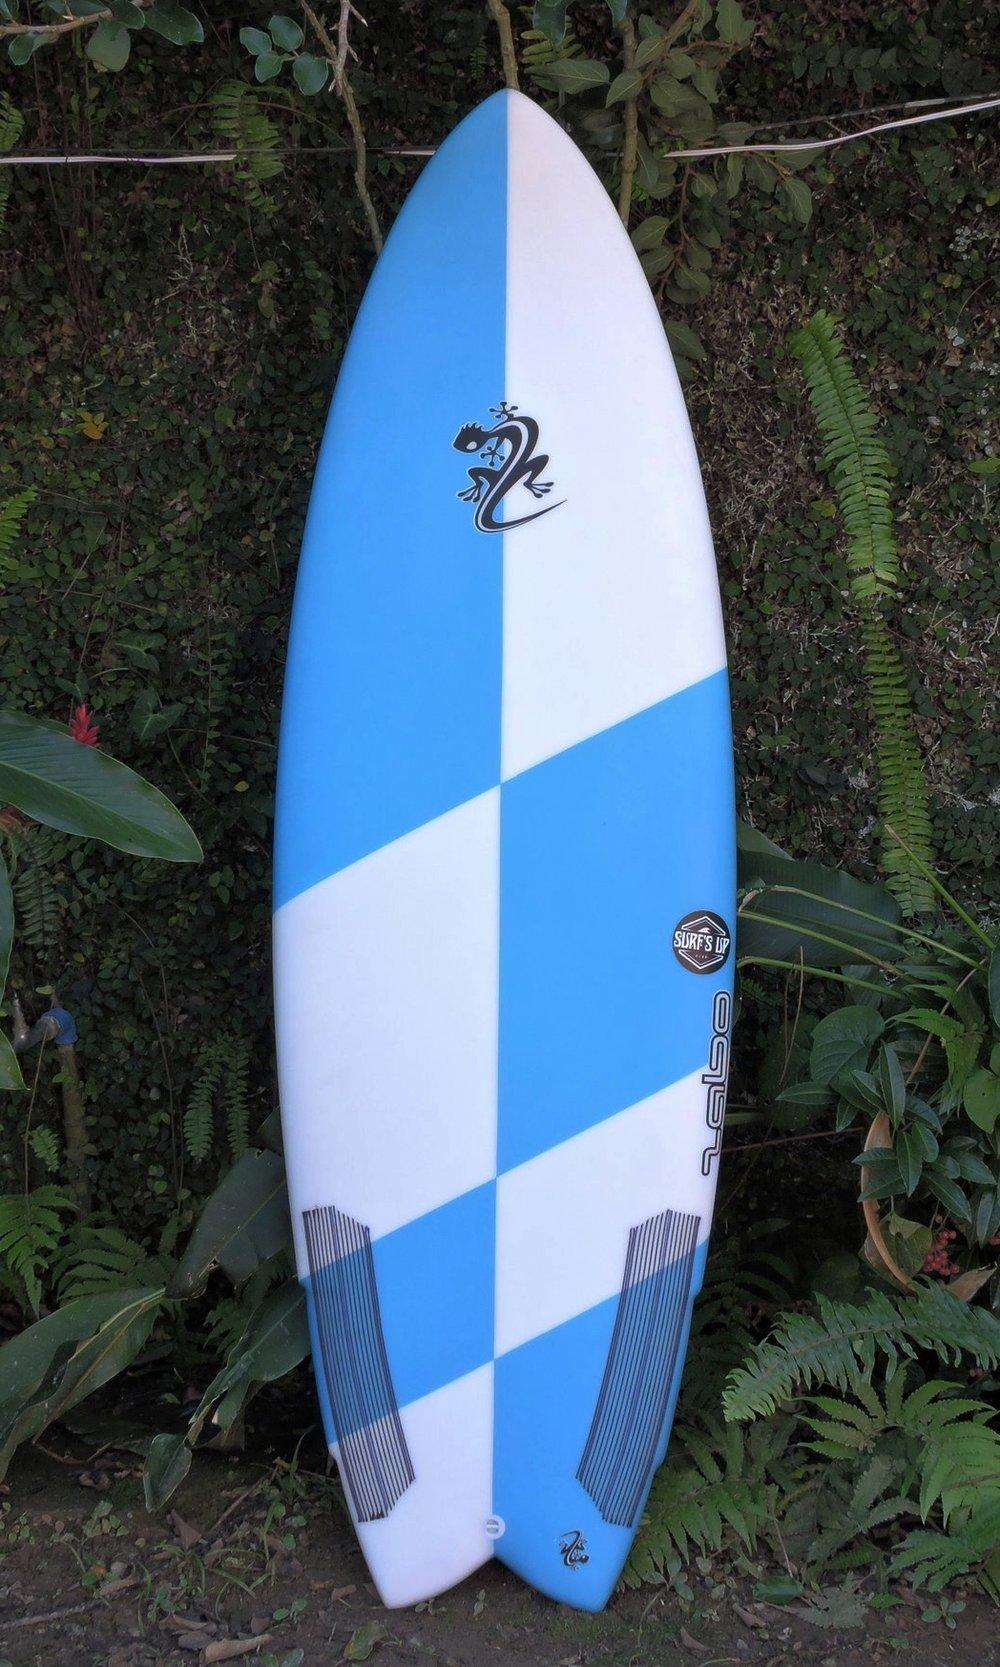 Torped - Zabo Surfboards5'5